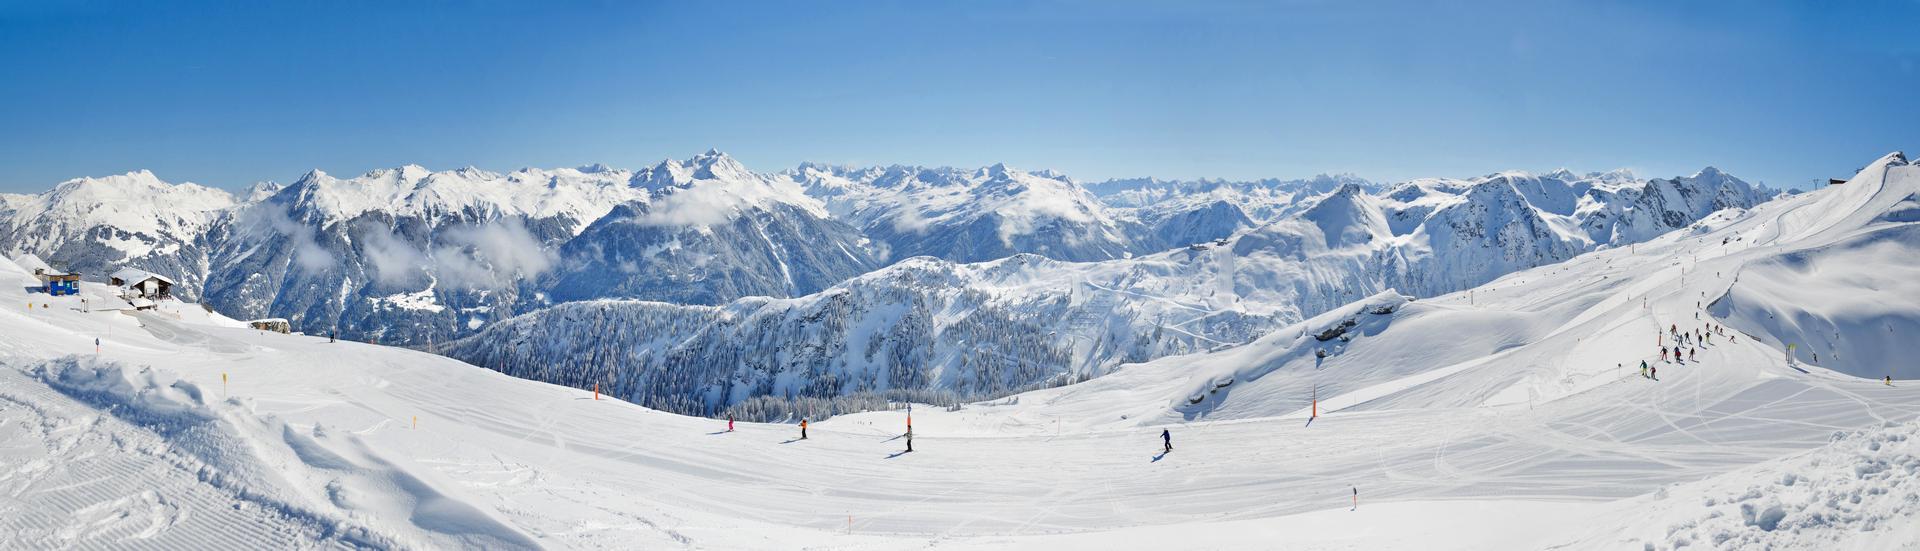 skiurlaub-im-montafon